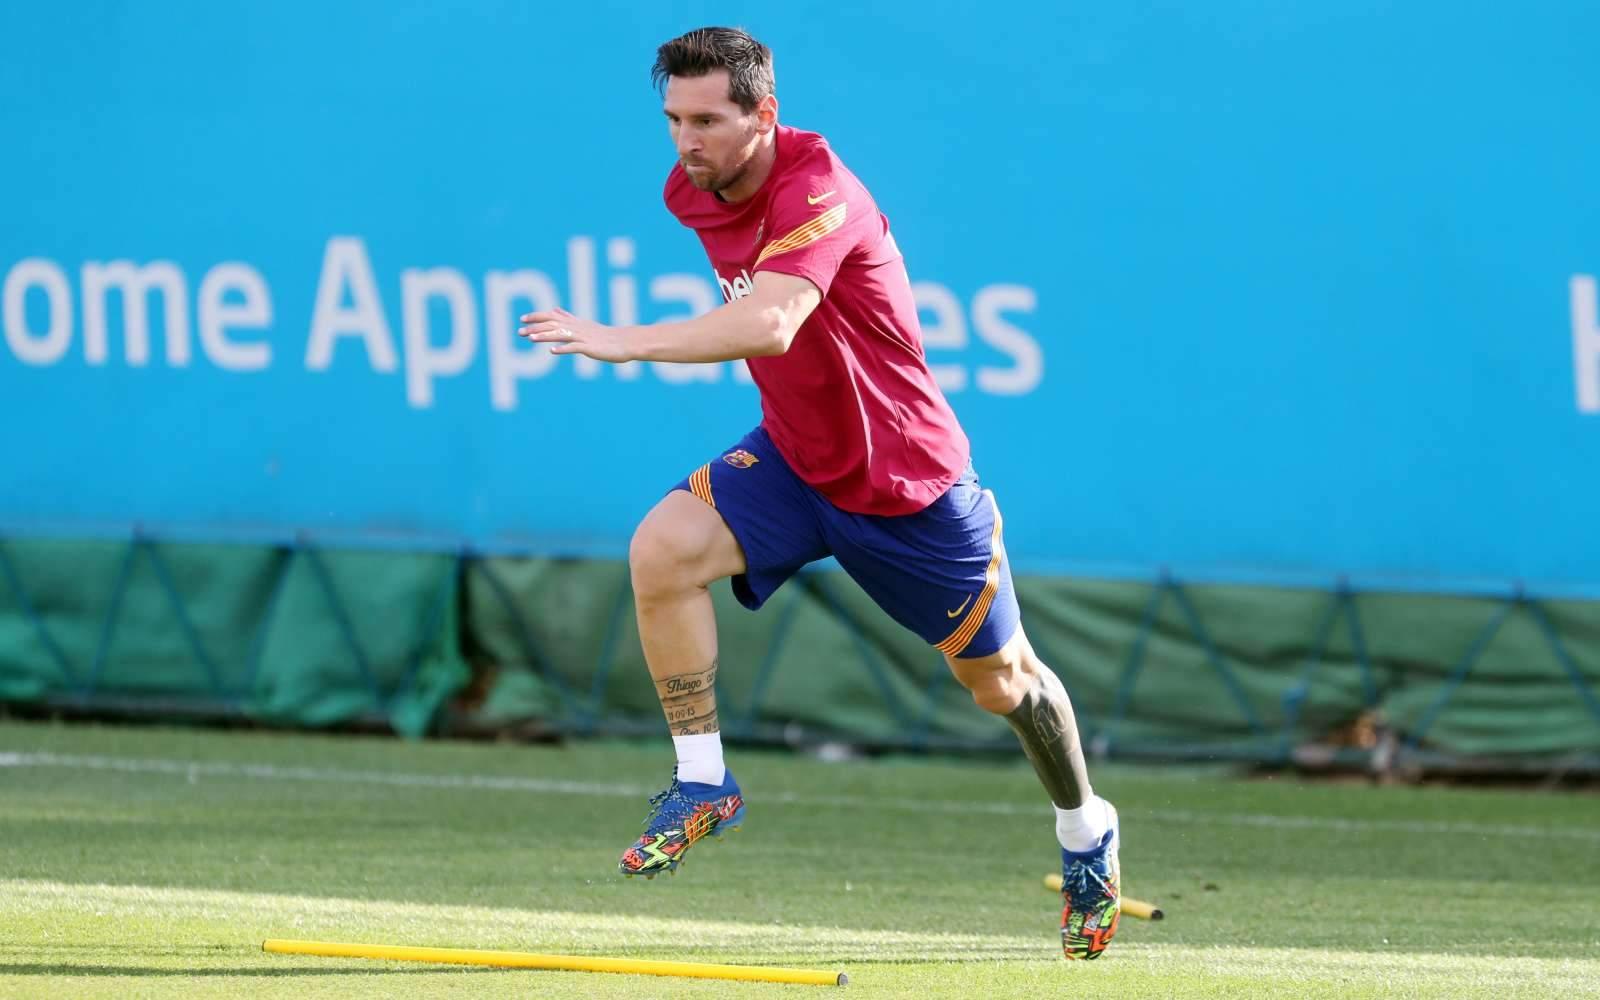 Дубль Месси помог «Барселоне» разгромить «Эльче»